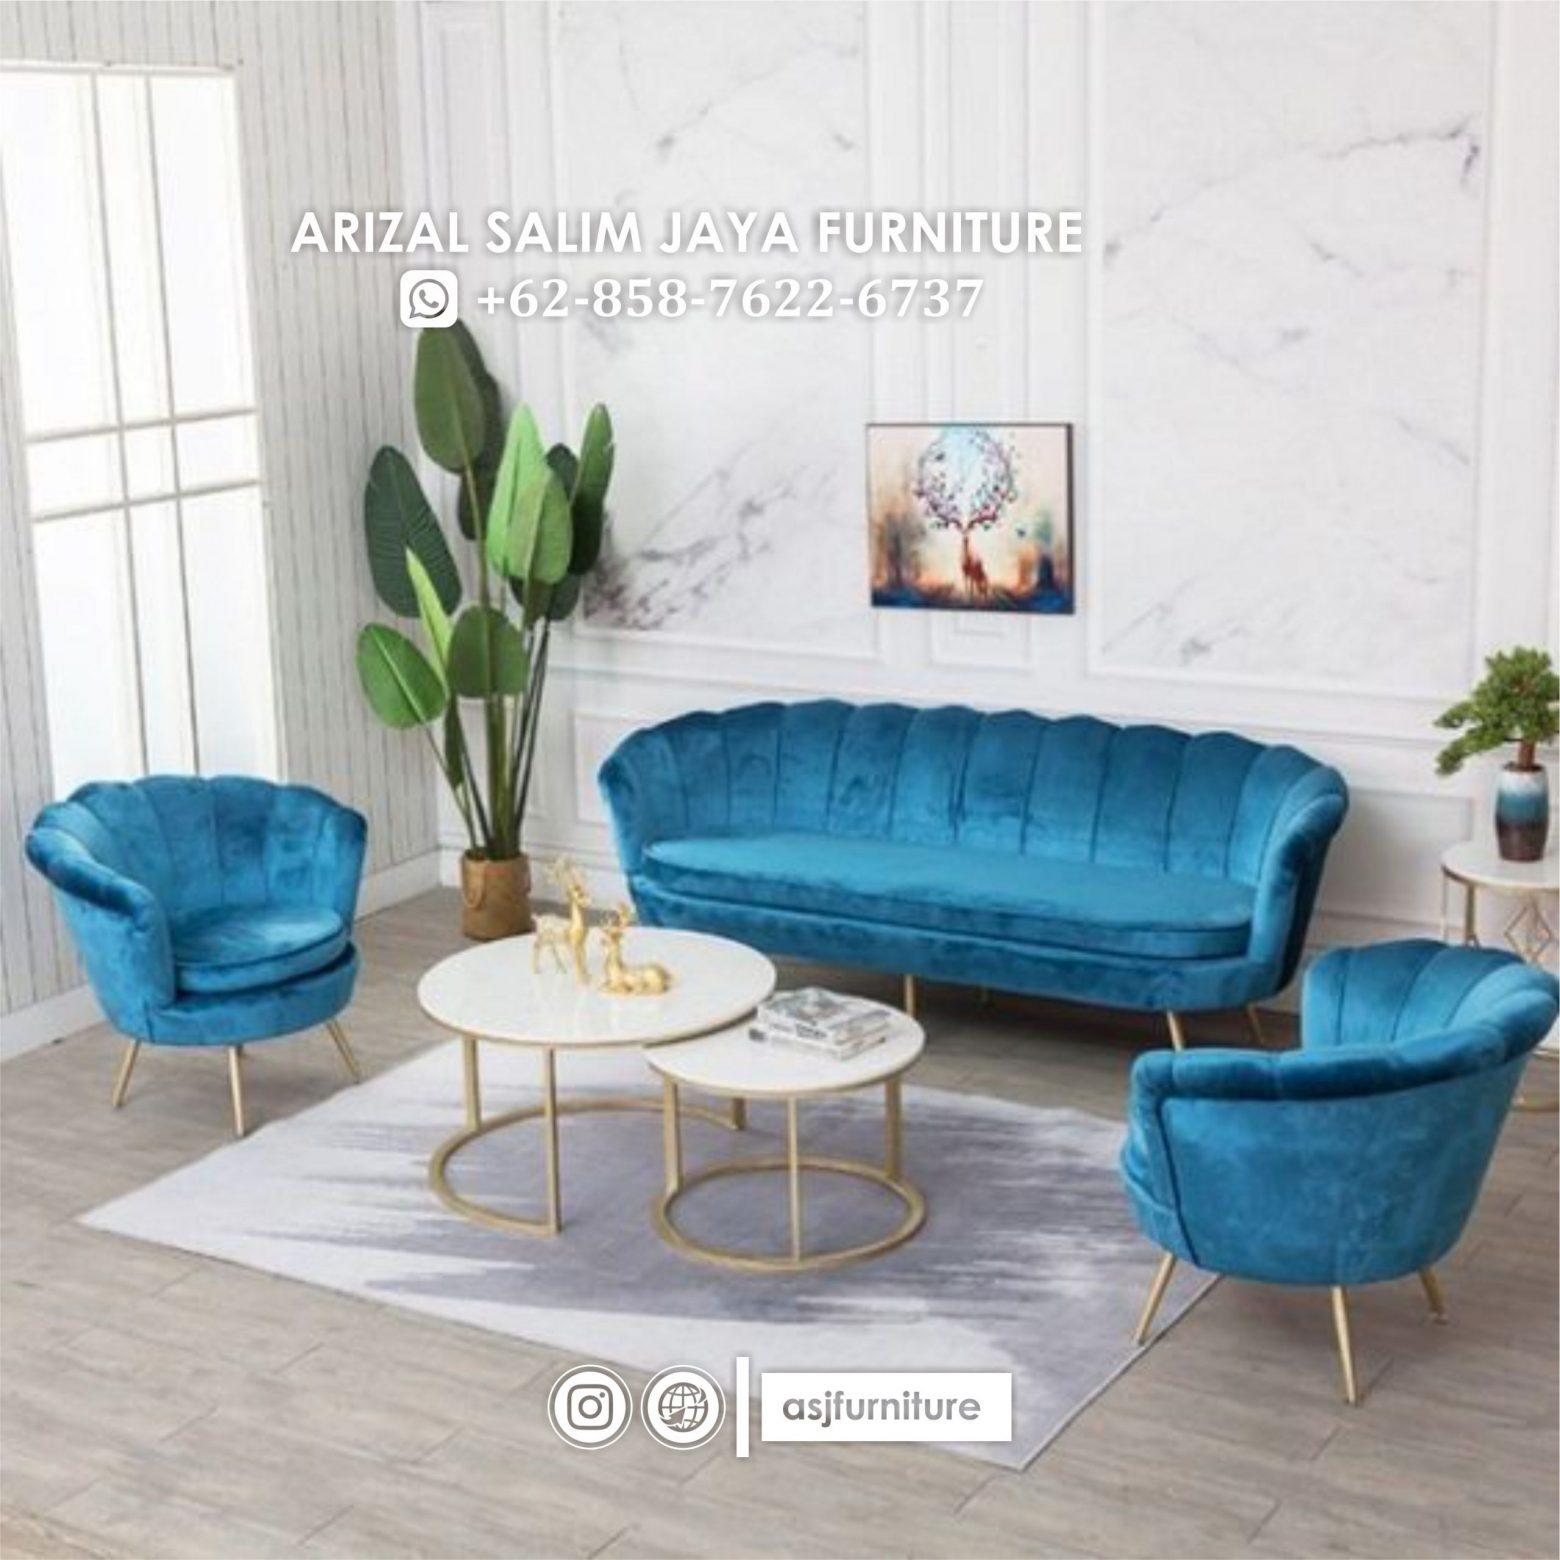 Set Sofa Kerang Meja Marmer Stainless